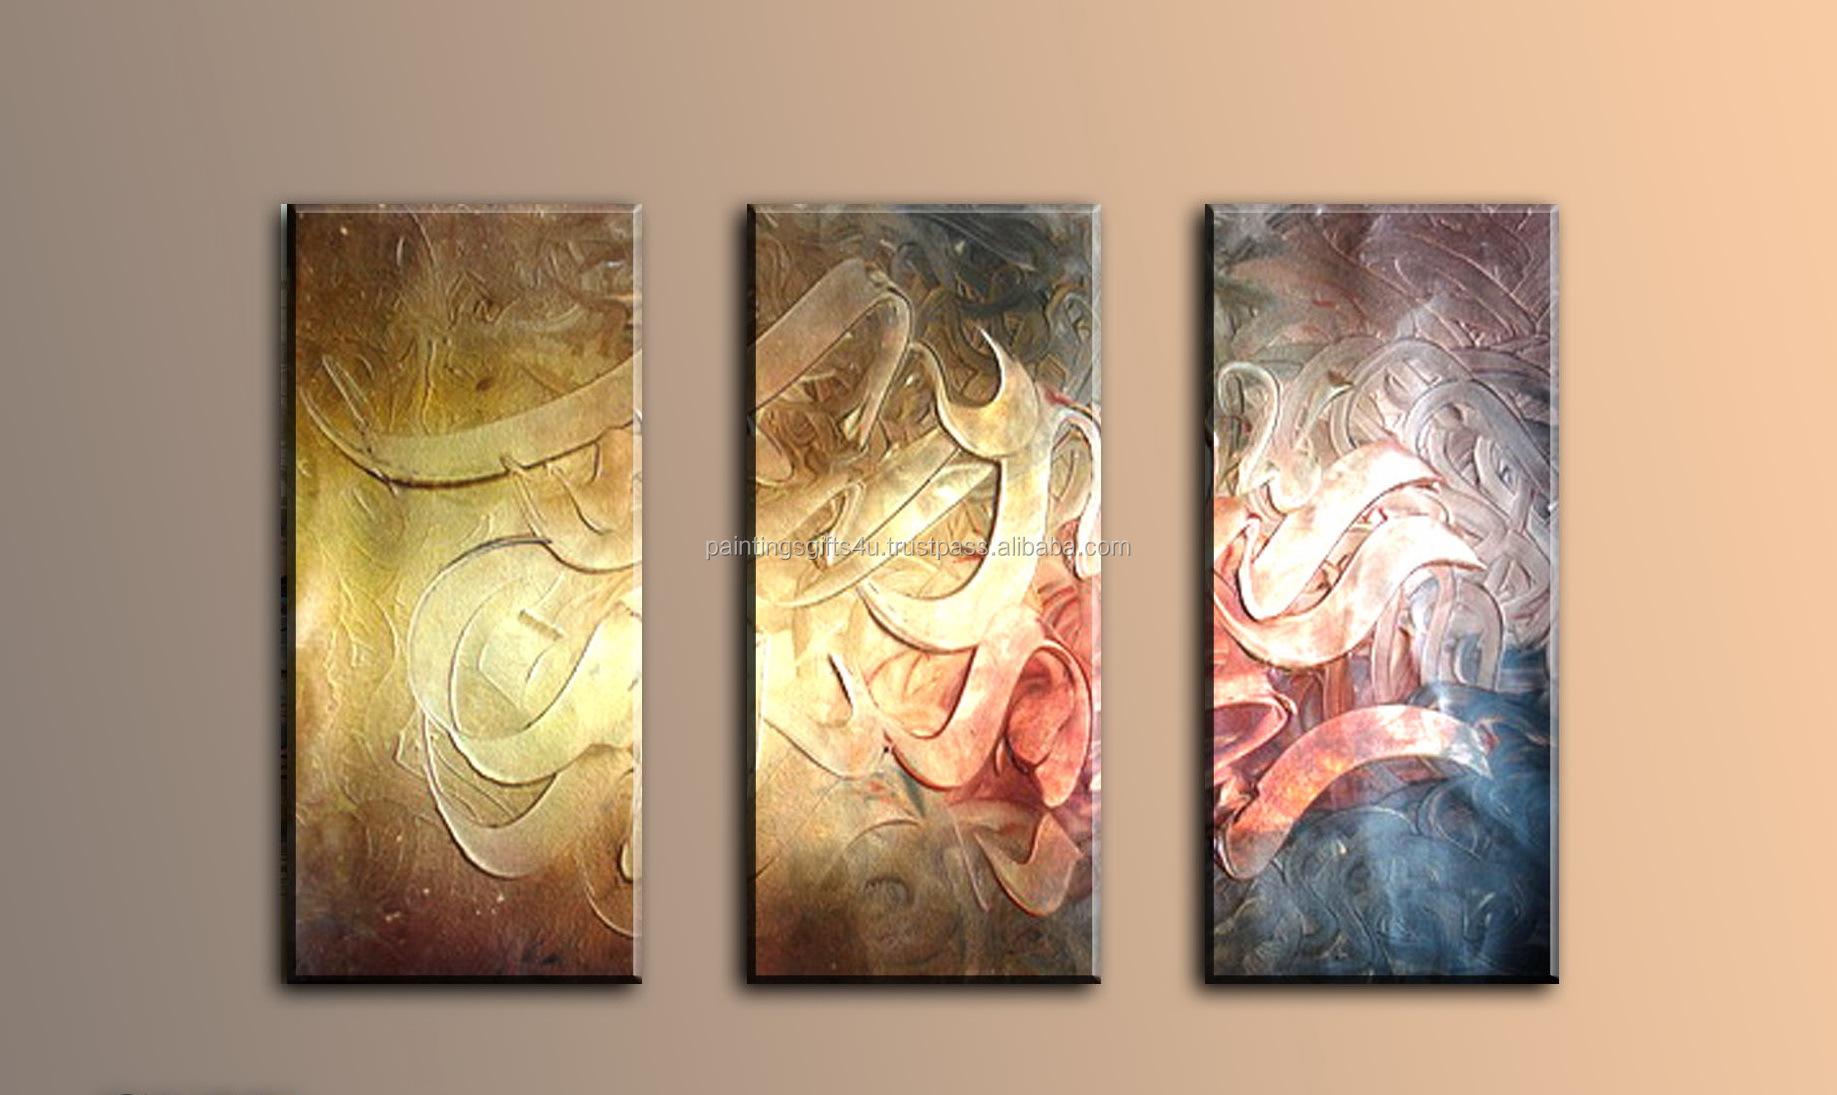 Calligraphy / Islamic Calligraphy Oil Painting / Islamic Calligraphy ...